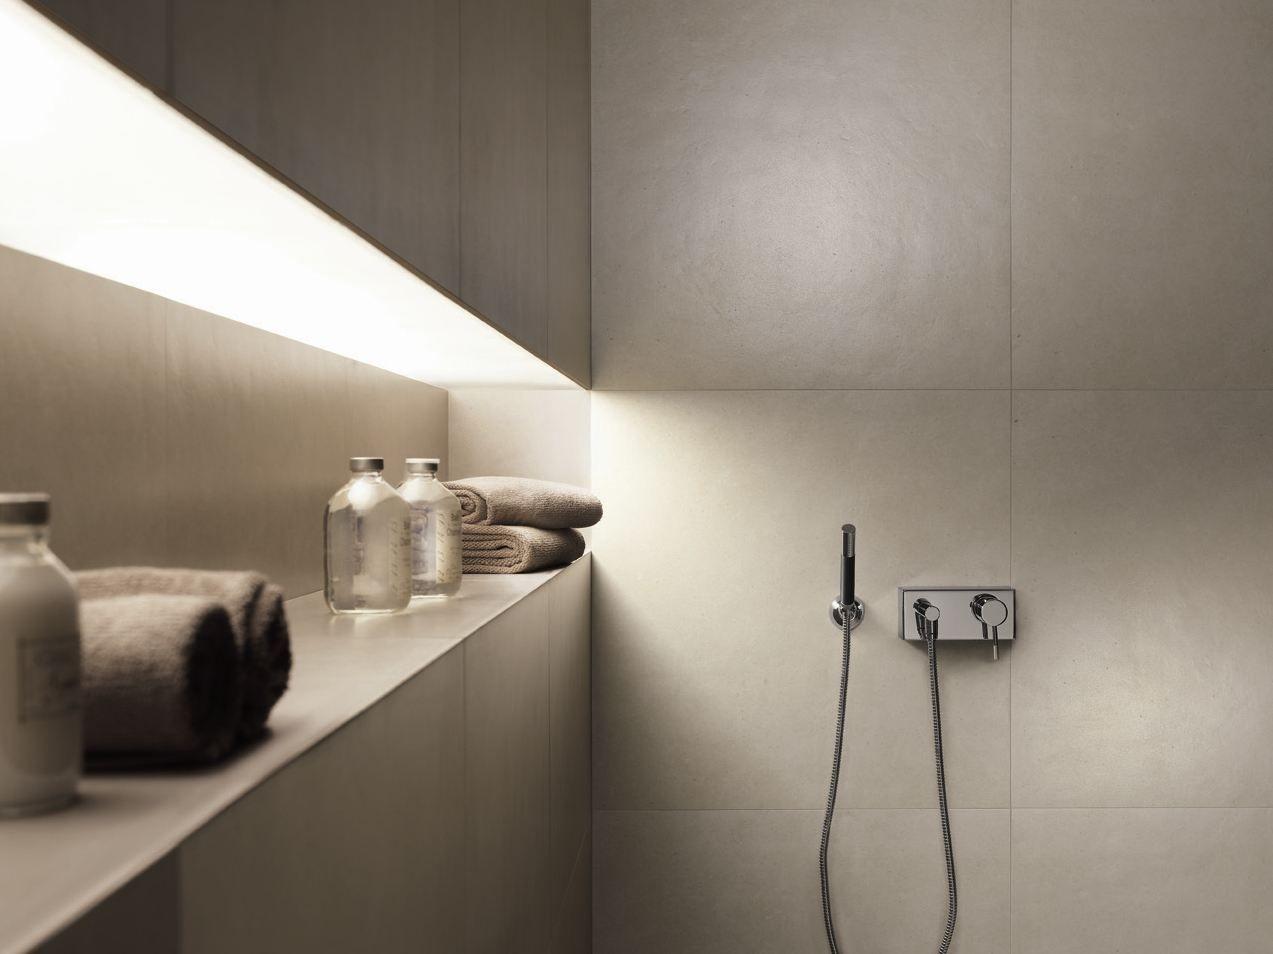 base wall tiles by fap ceramiche. Black Bedroom Furniture Sets. Home Design Ideas